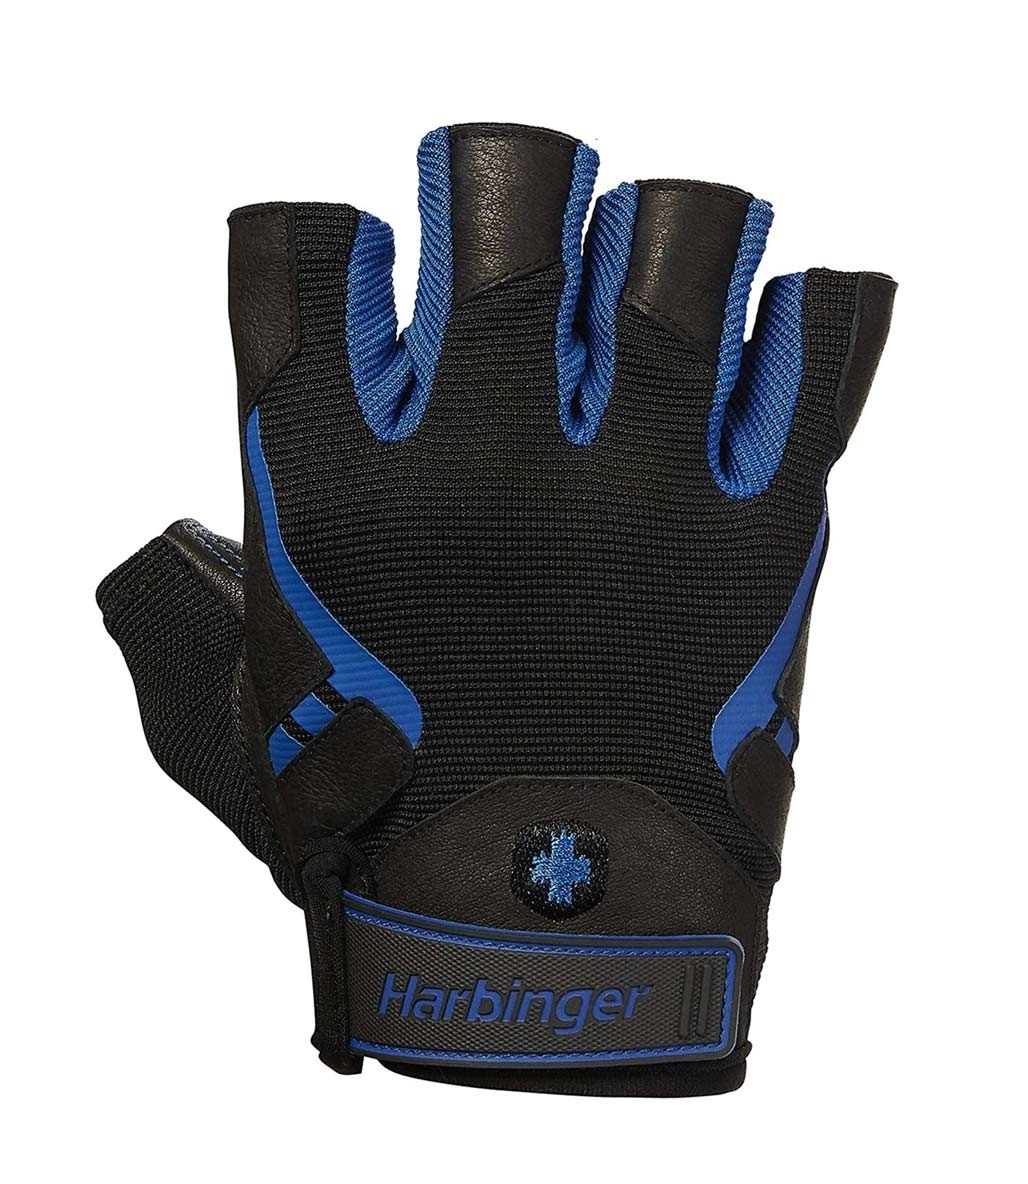 Harbinger Pro Gloves Fitness Eldiveni Siyah Mavi